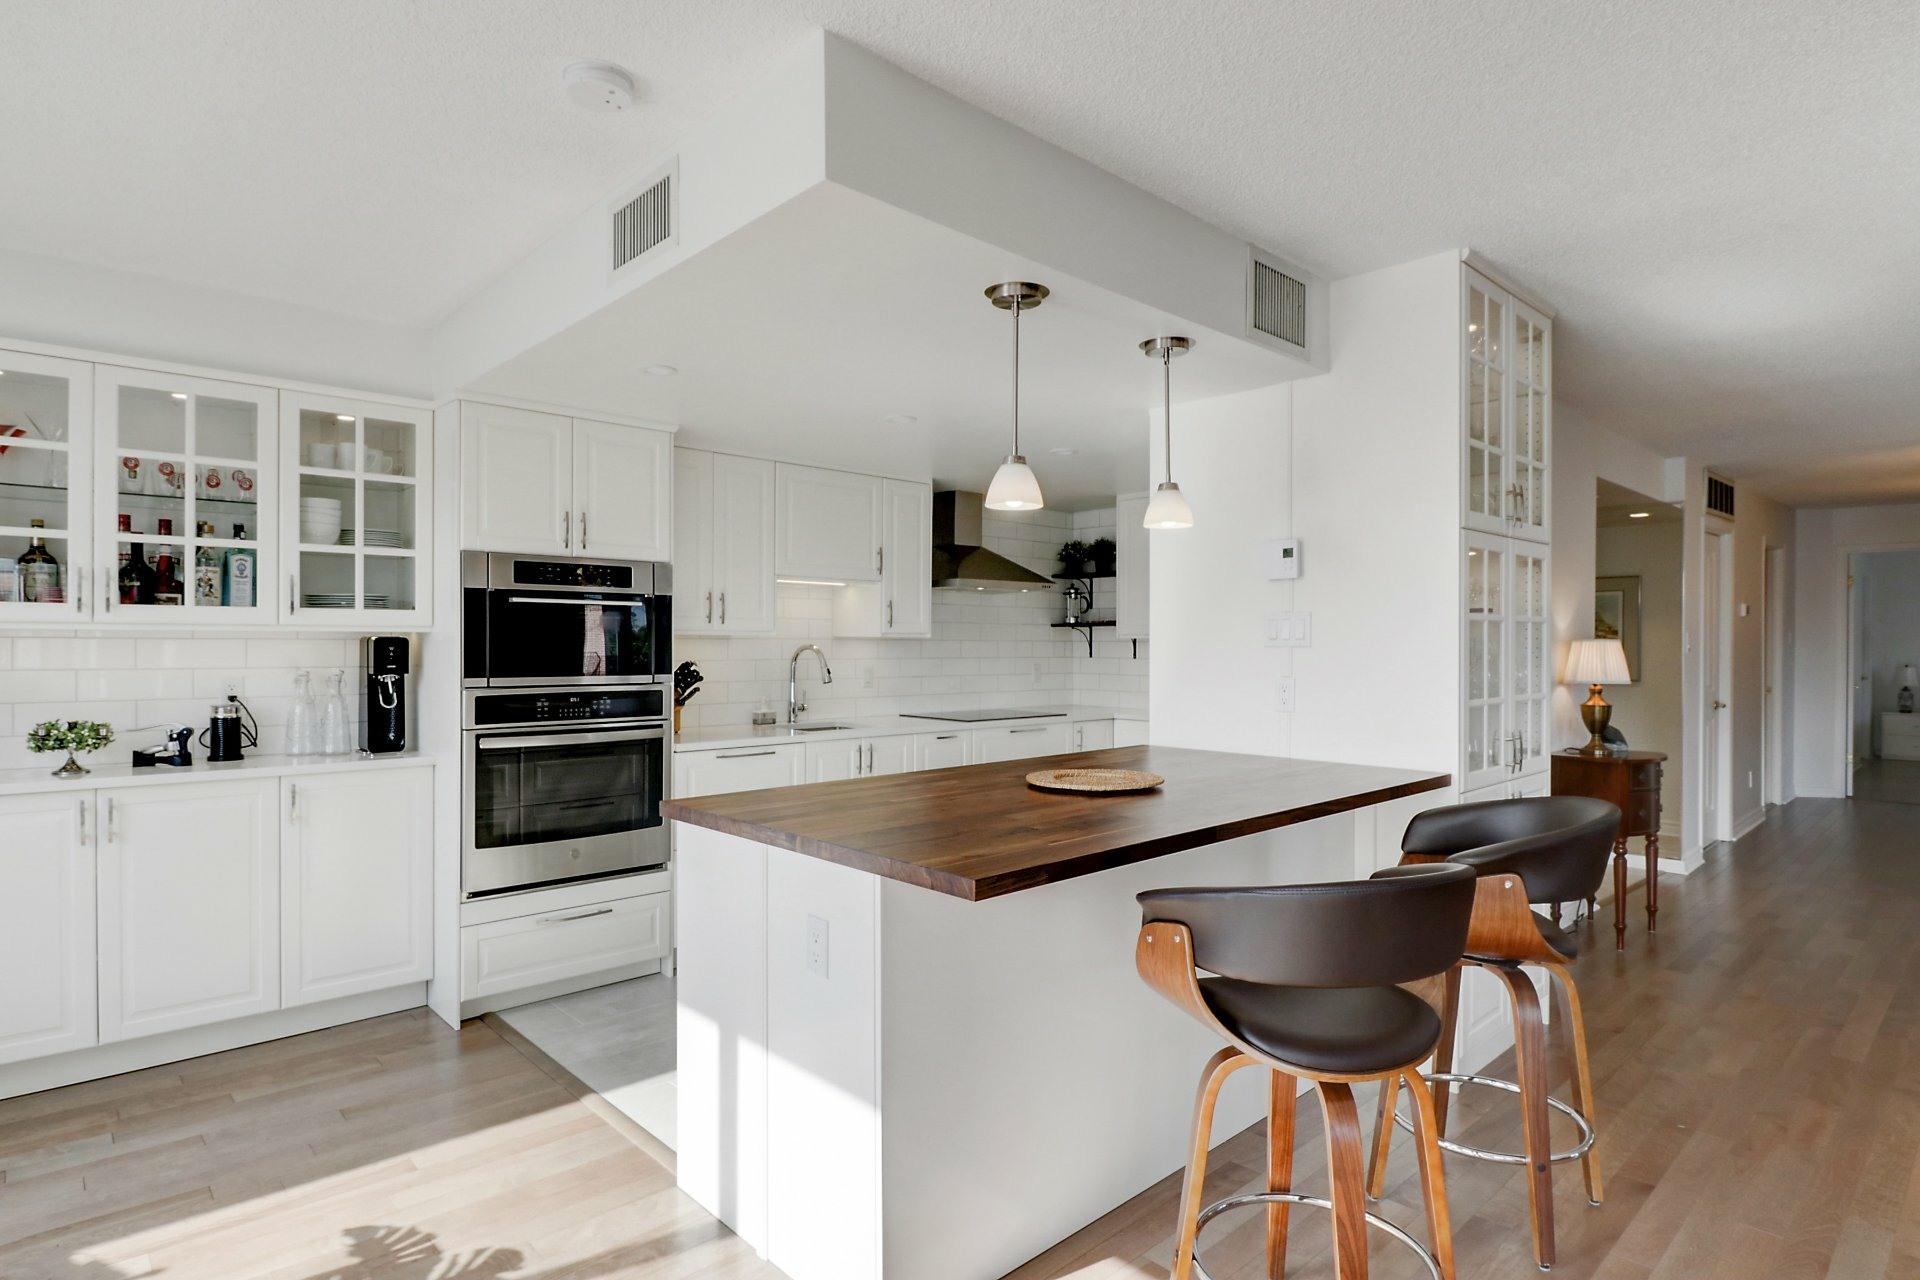 image 4 - Apartment For sale Beloeil - 9 rooms